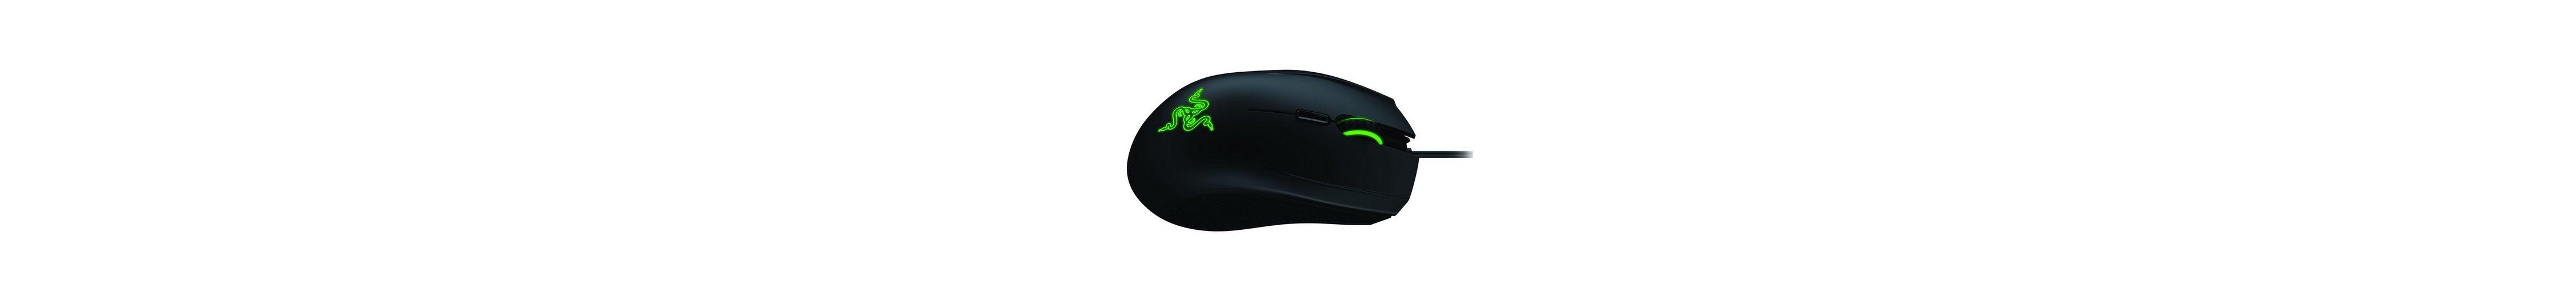 RAZER Gaming Maus »Abyssus V2«